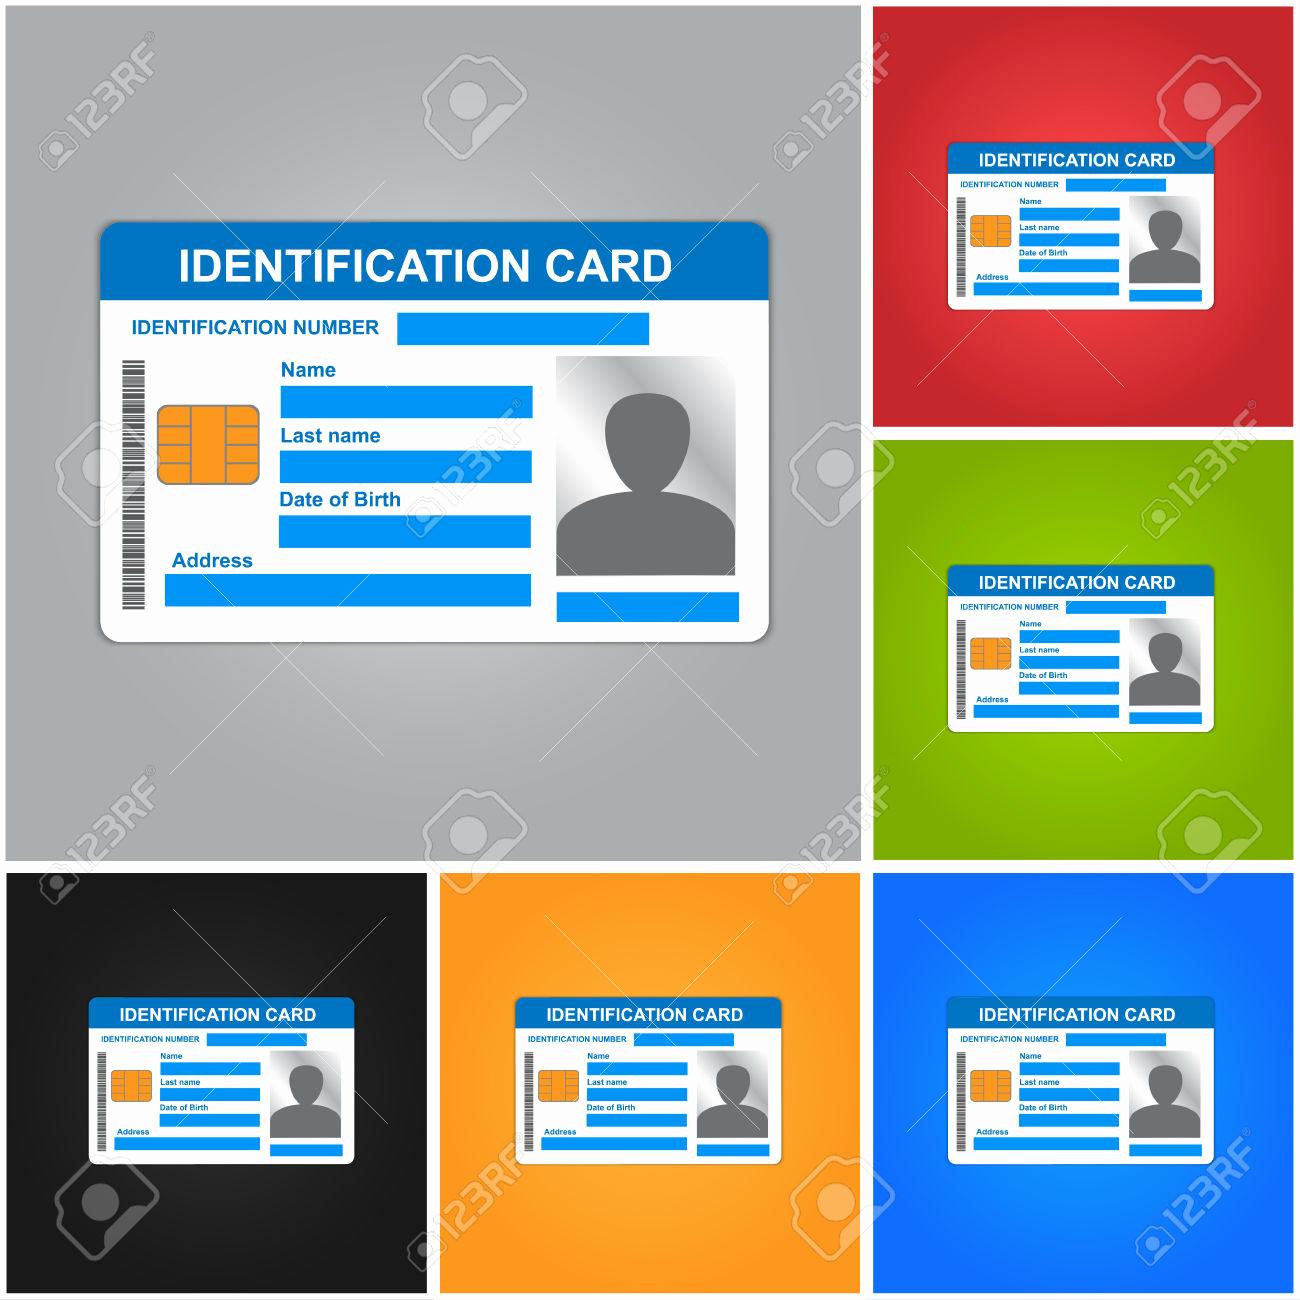 Student Id Card Template Best Of 10 Student Card Templates Editable Psd Ai Vector Eps